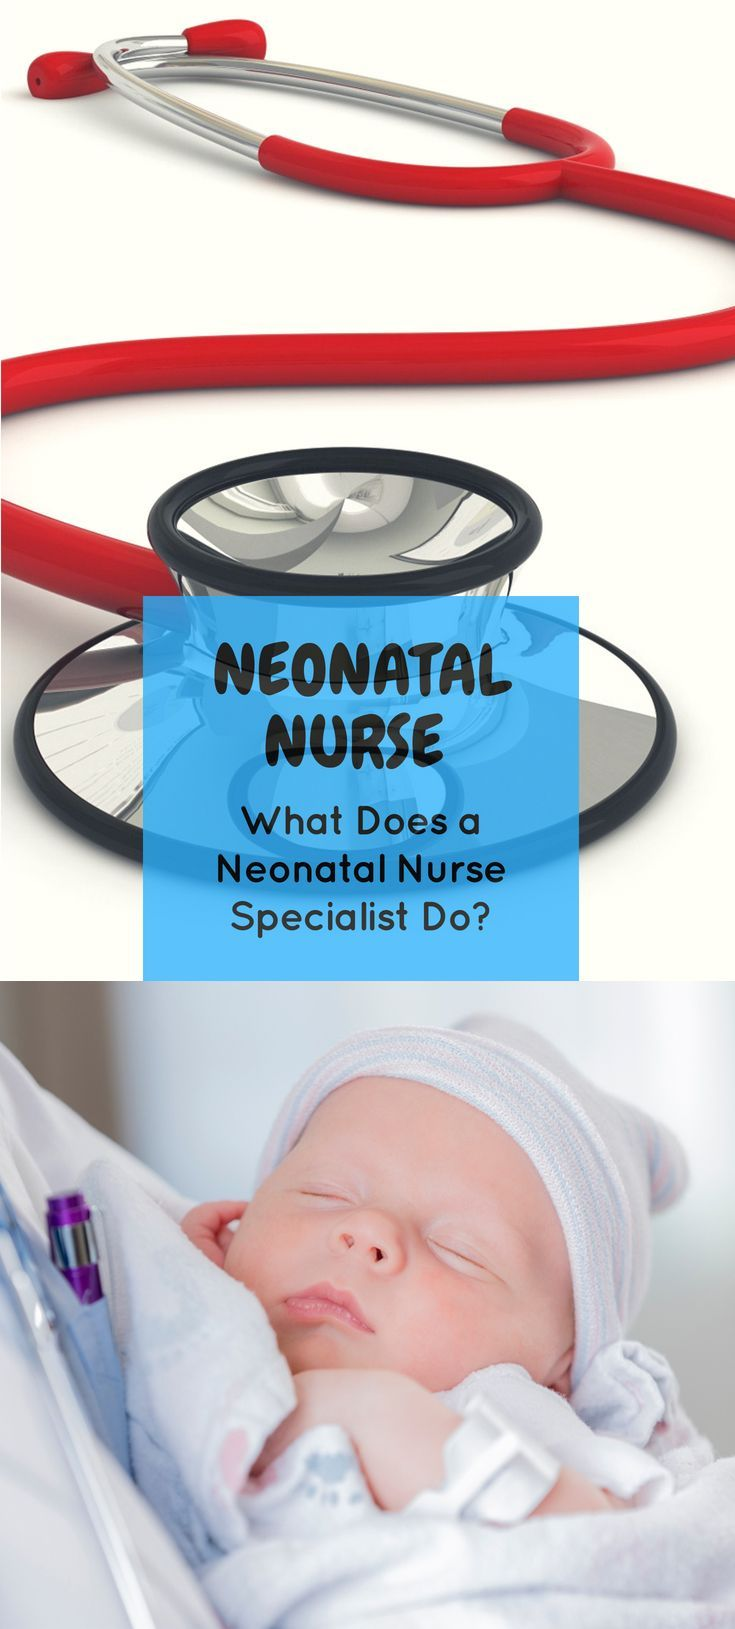 Neonatal nurse practitioner salary job description and